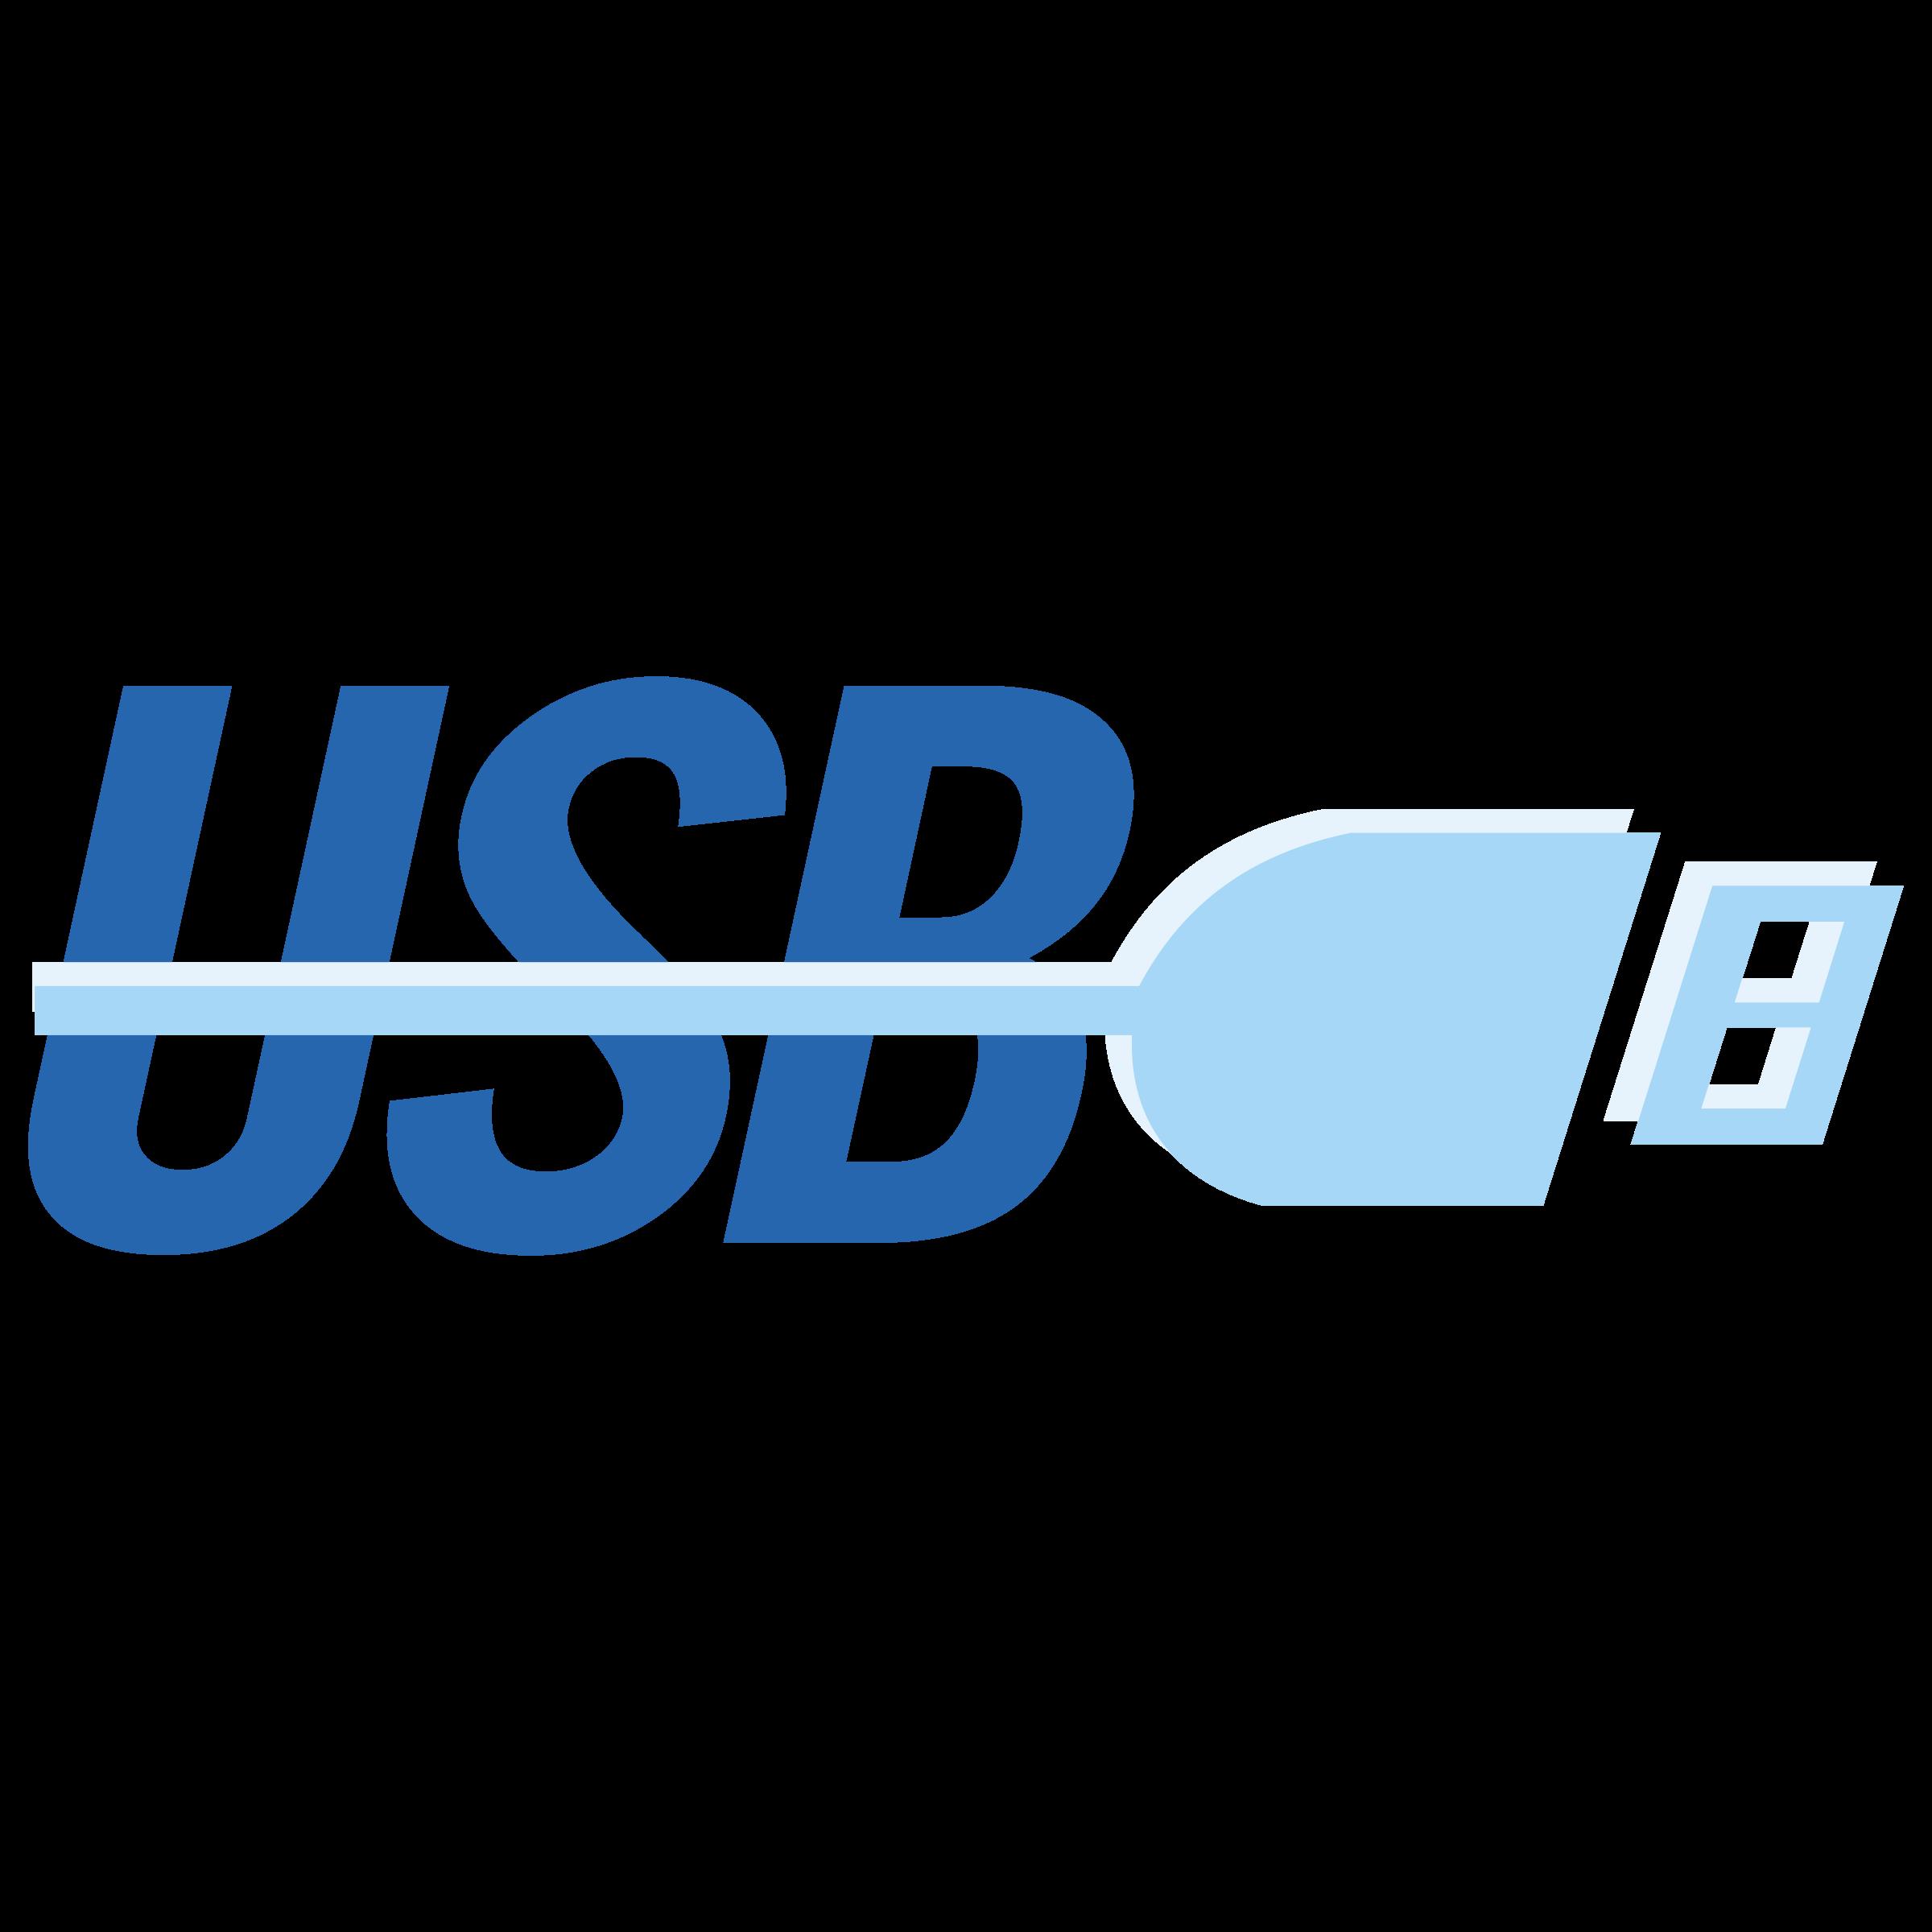 USB Logo PNG Transparent & SVG Vector.